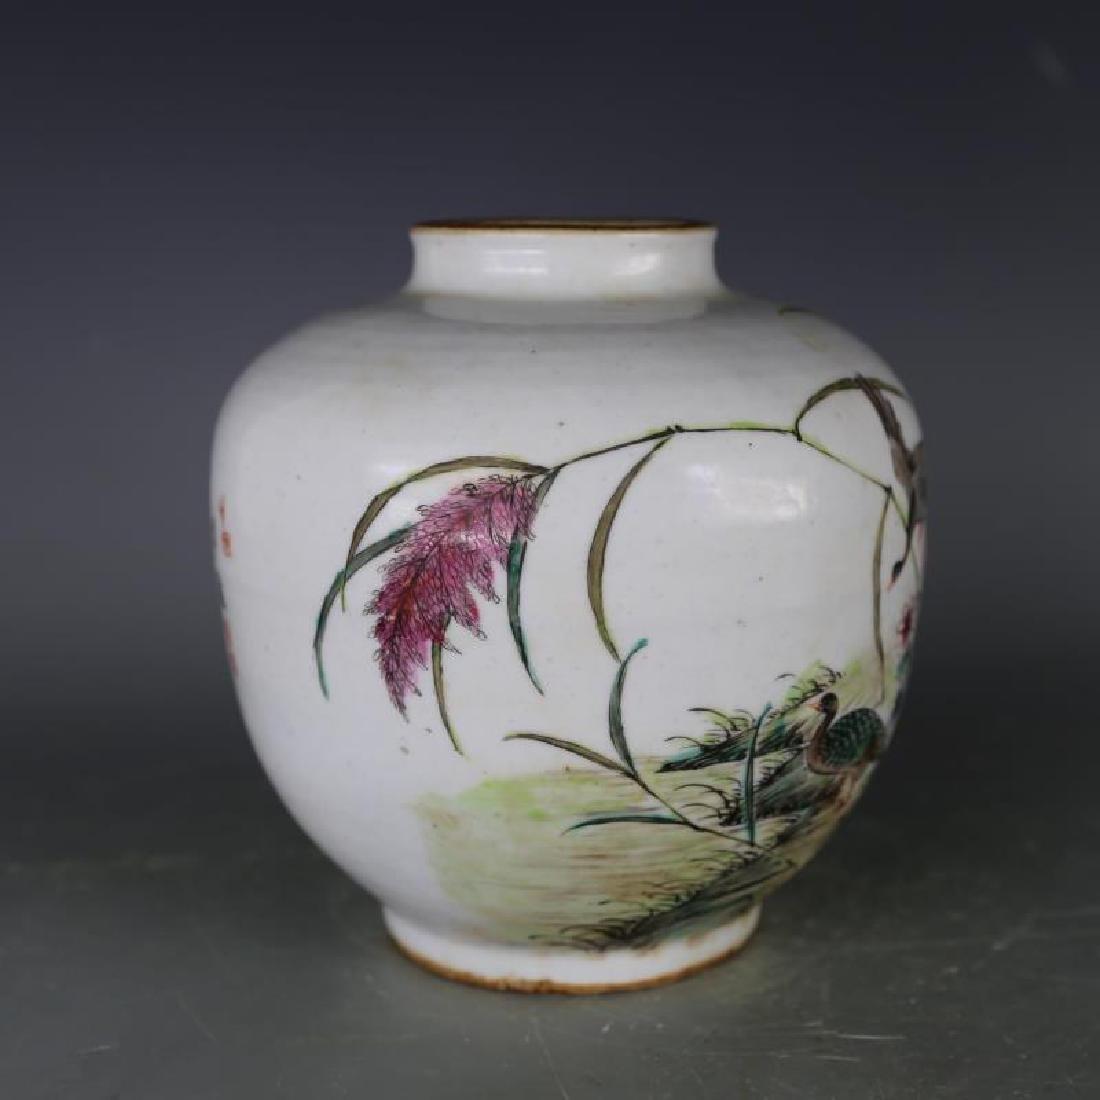 Chinese Qing Dynasty Famille-Rose Porcelain Jar - 3